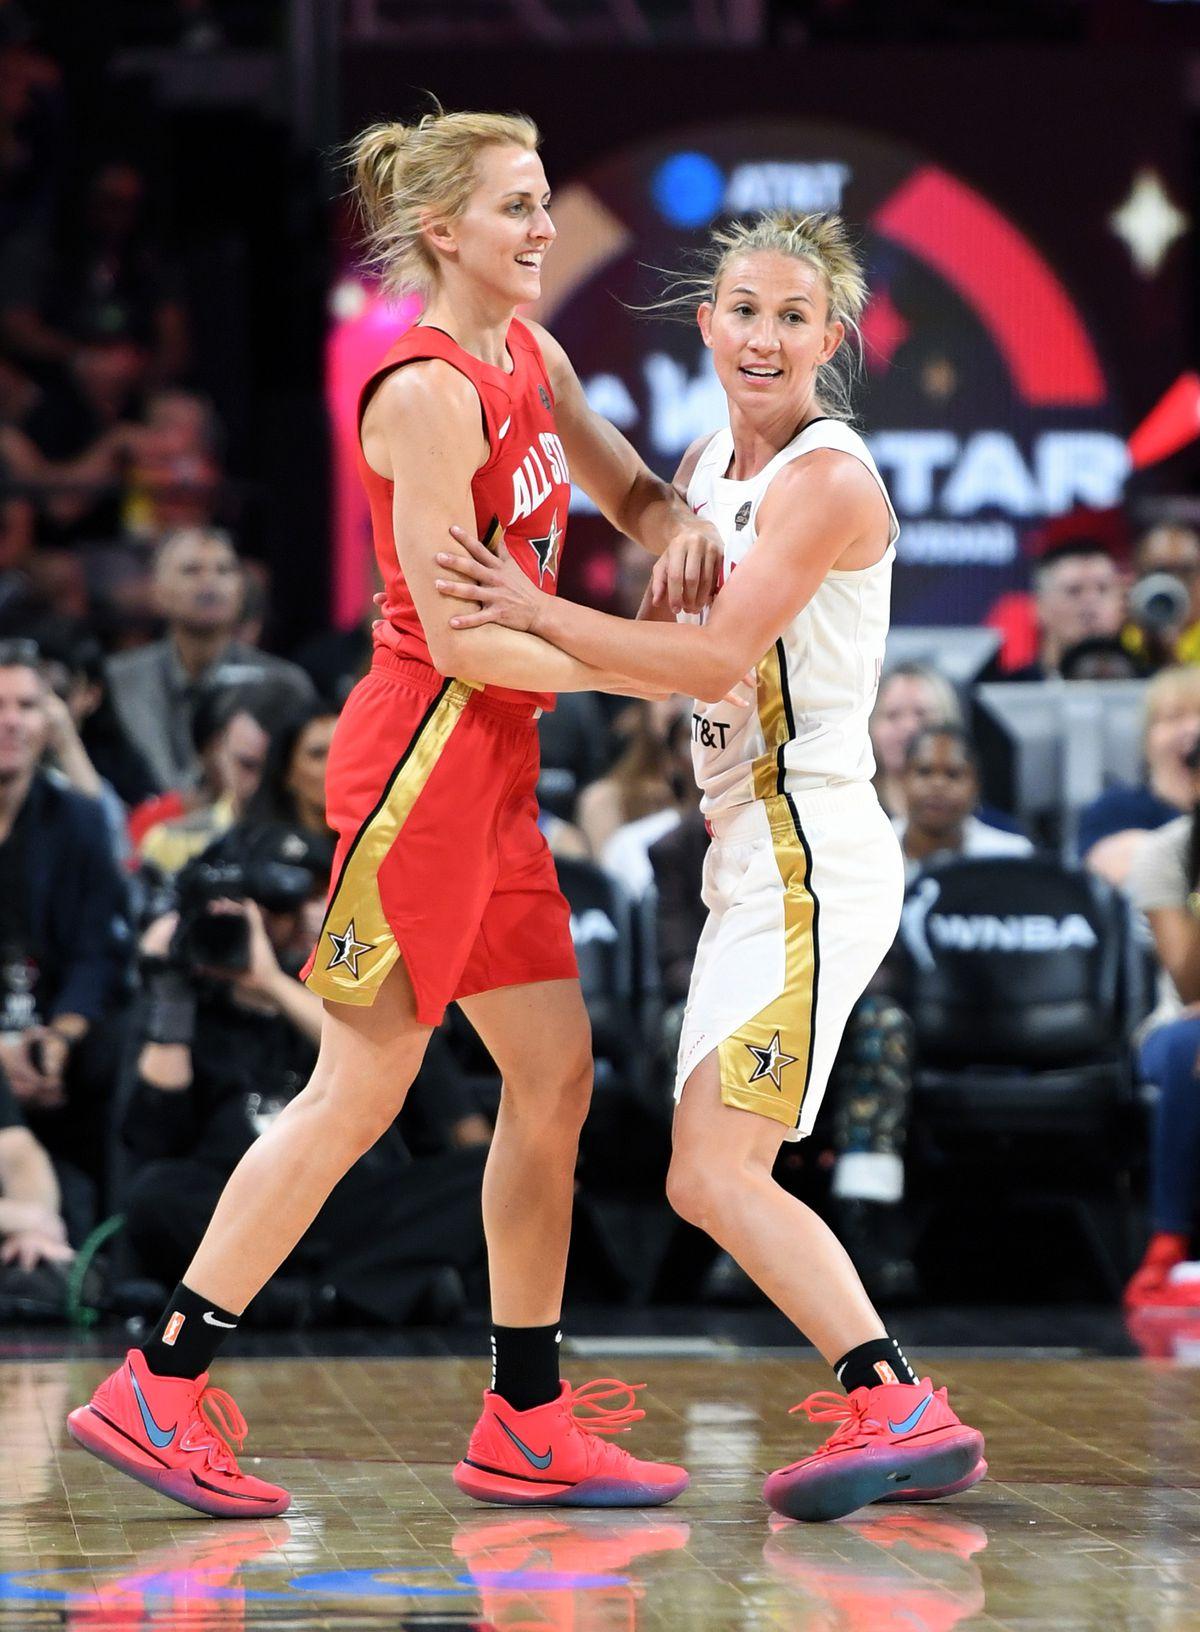 WNBA All-Star Game 2019